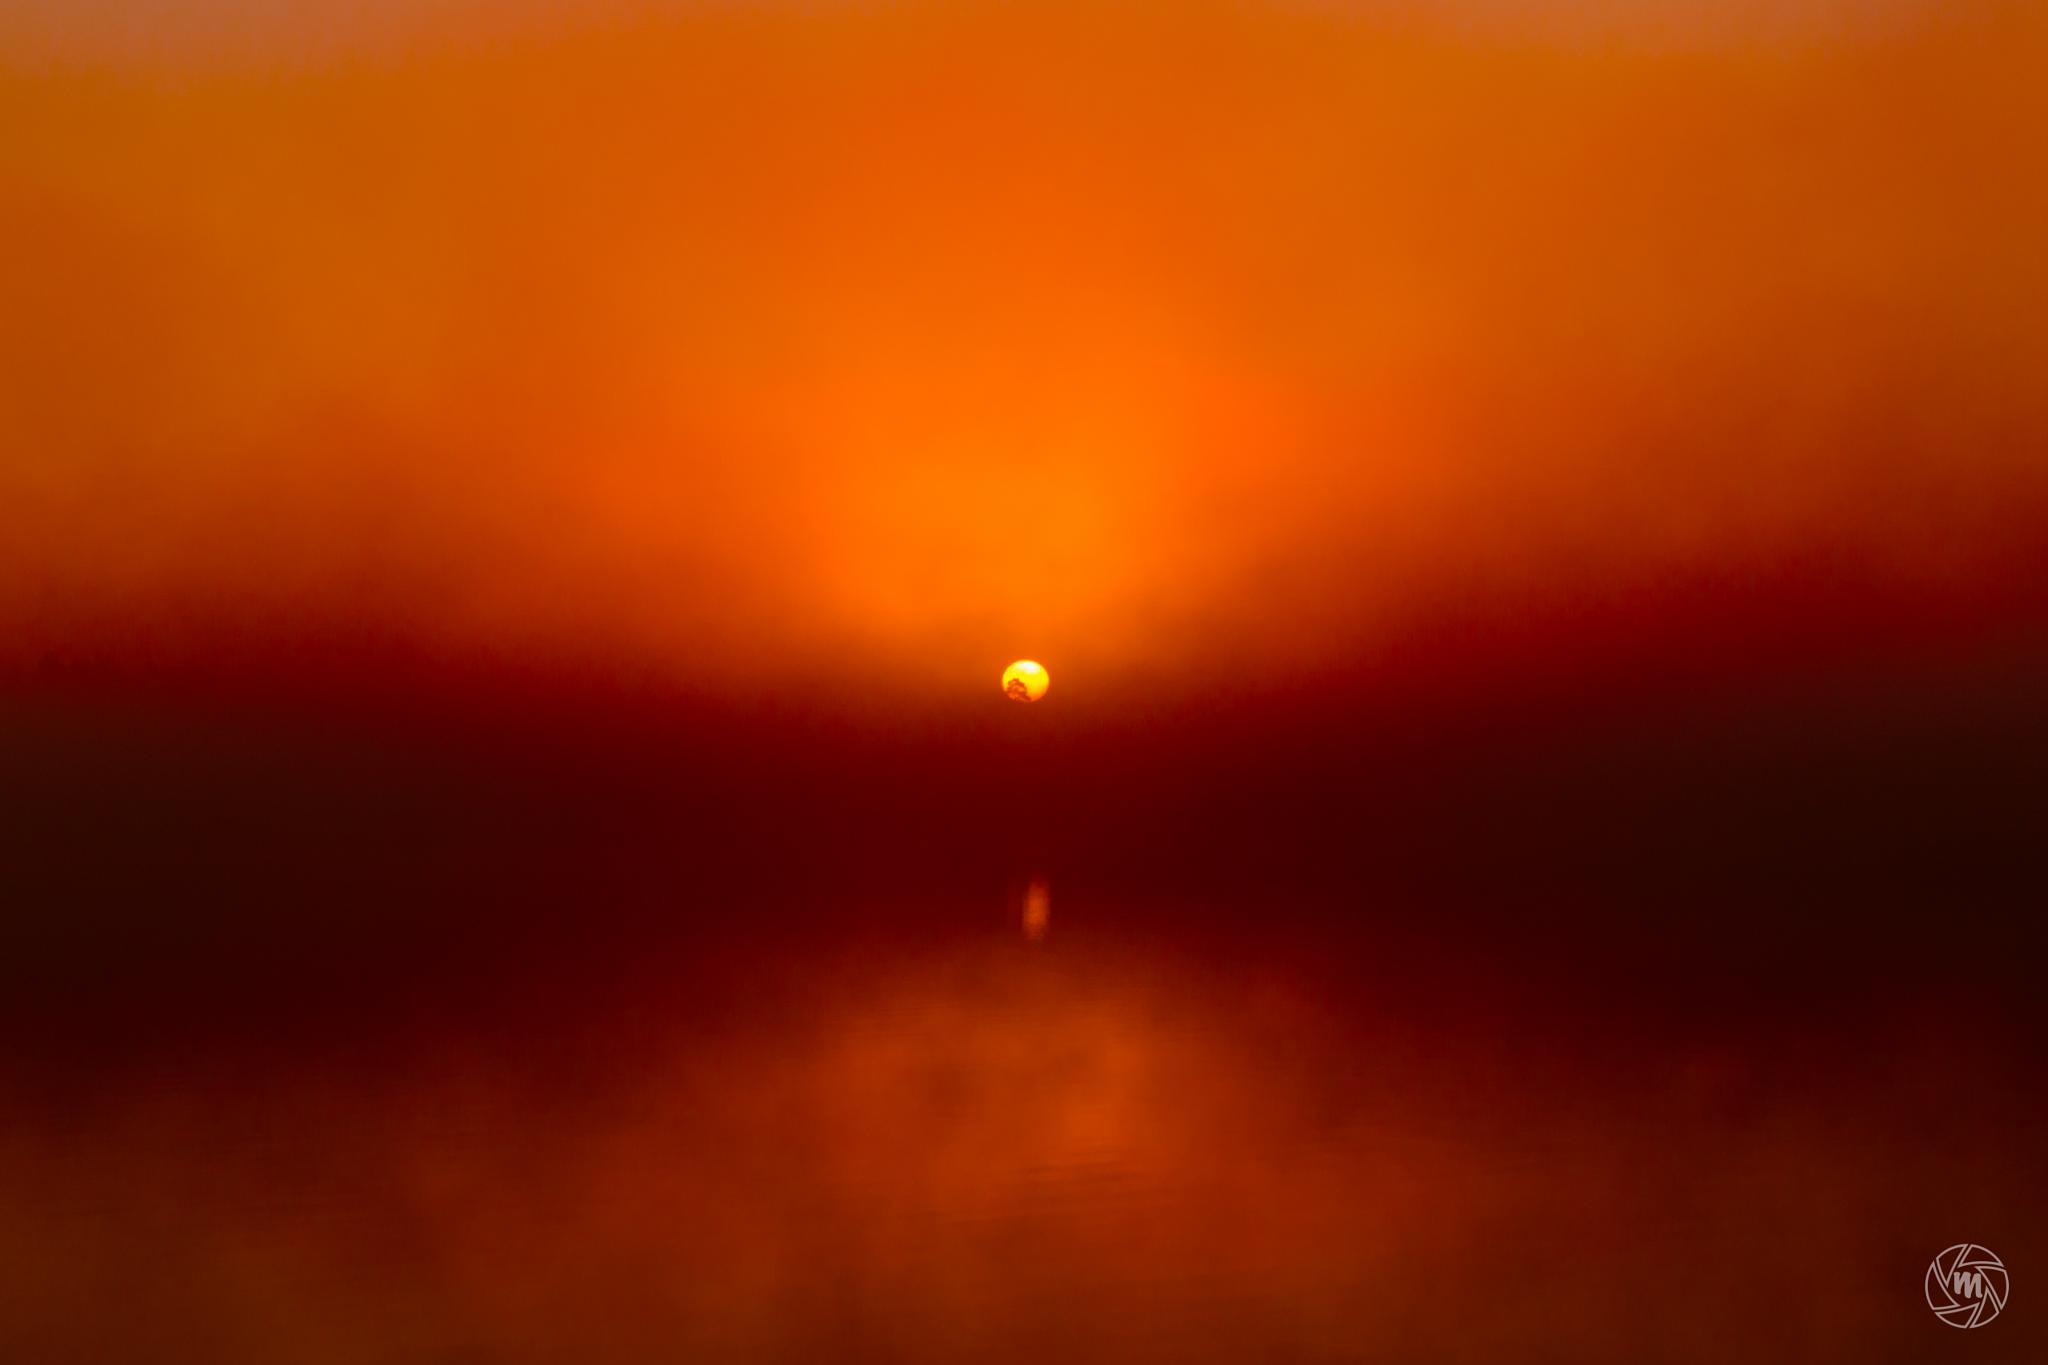 Foggy Red Sunrise by William Mevissen